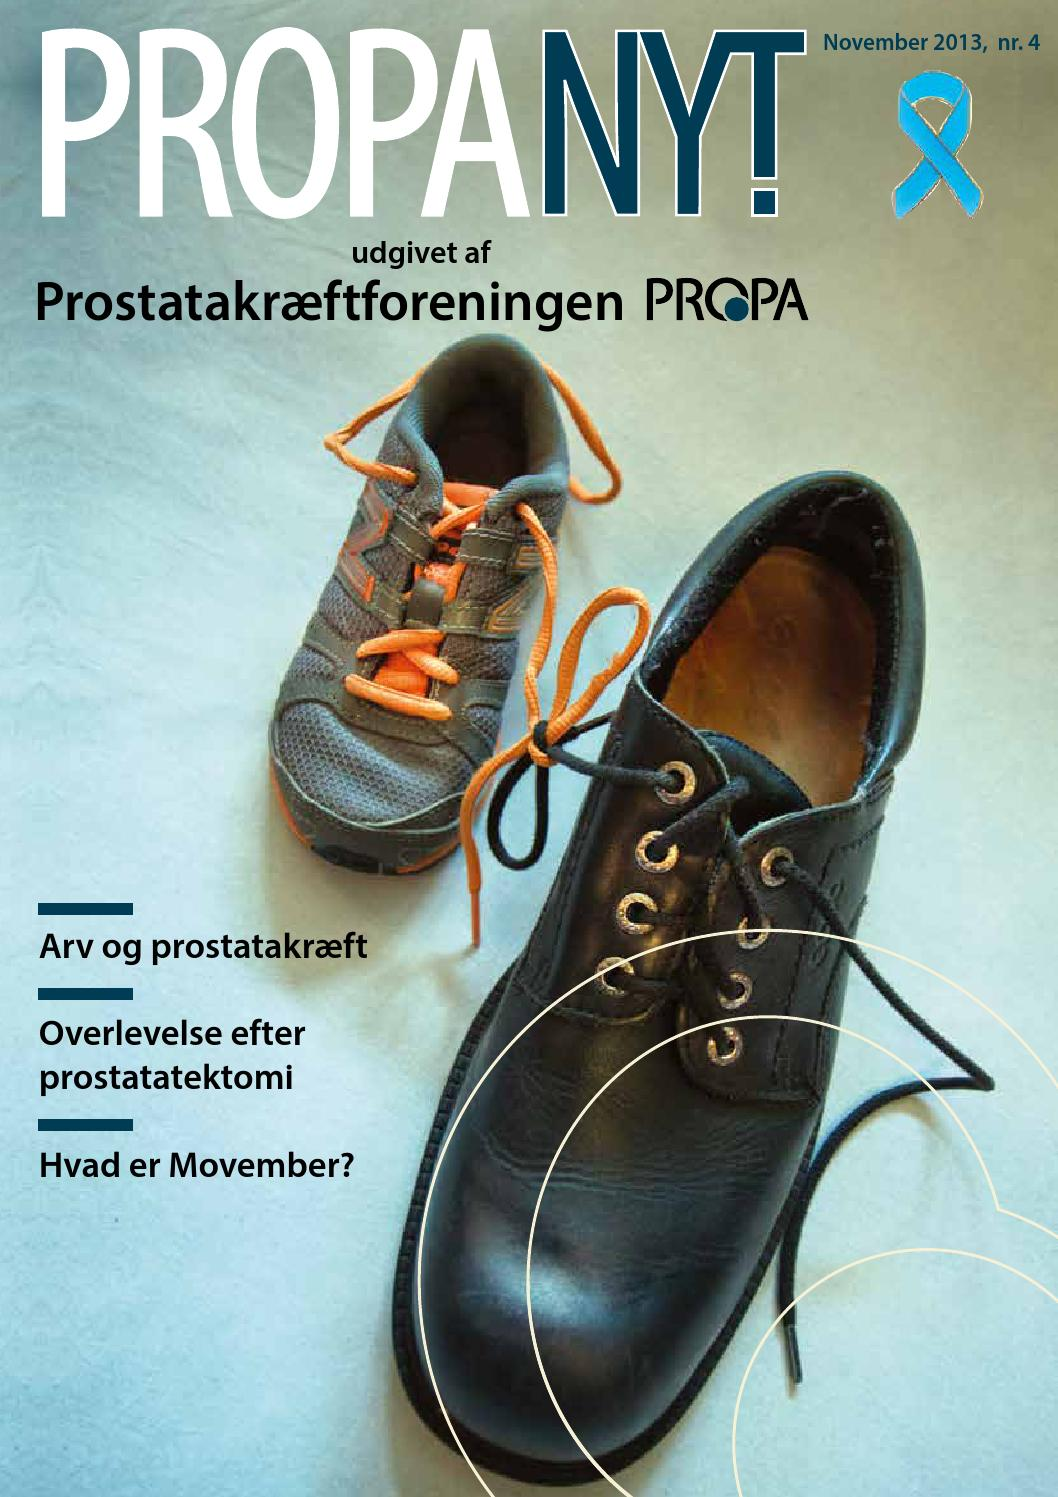 prostatakræft brca